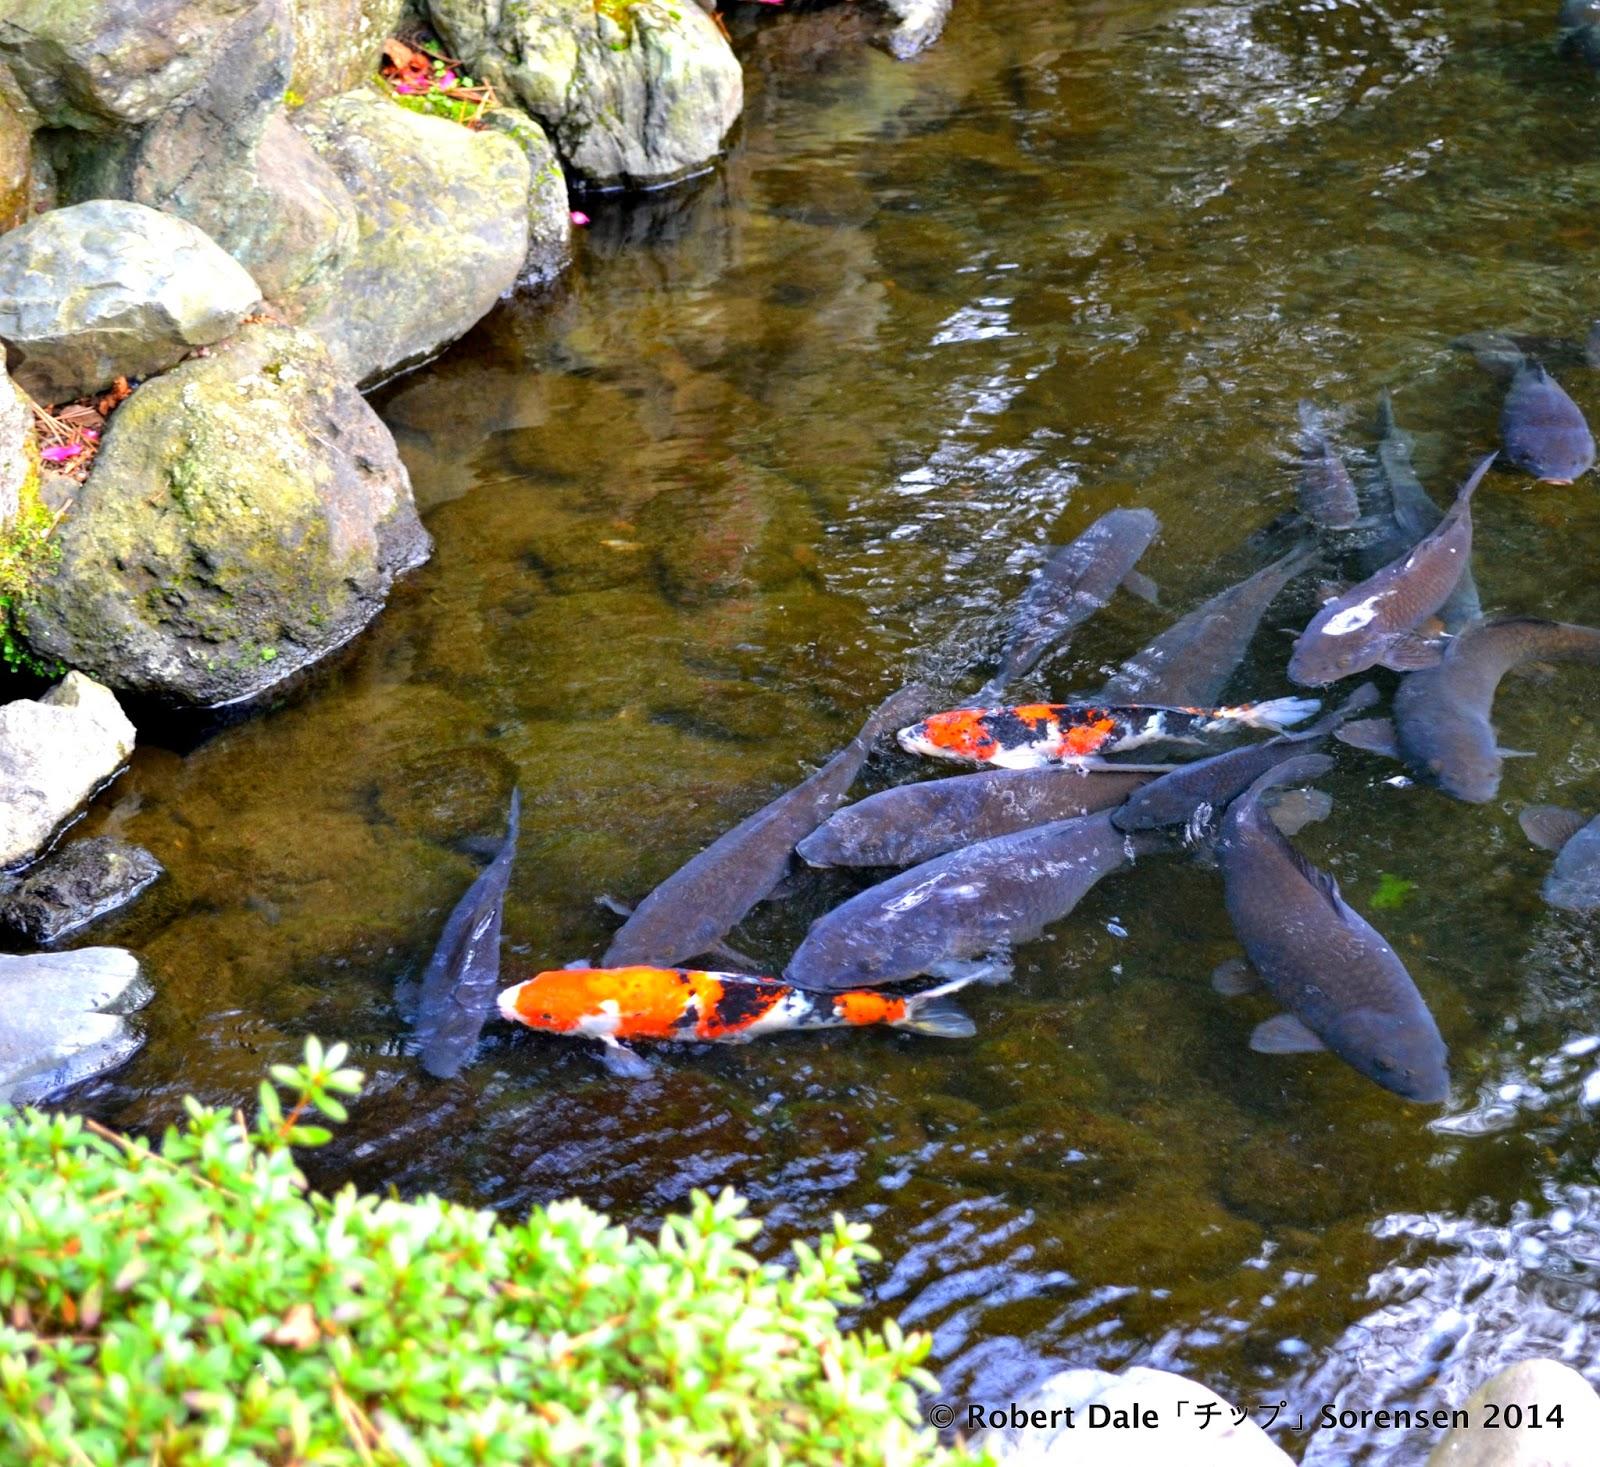 Koi Fish Pond Near Entrance Of Shrine Grounds